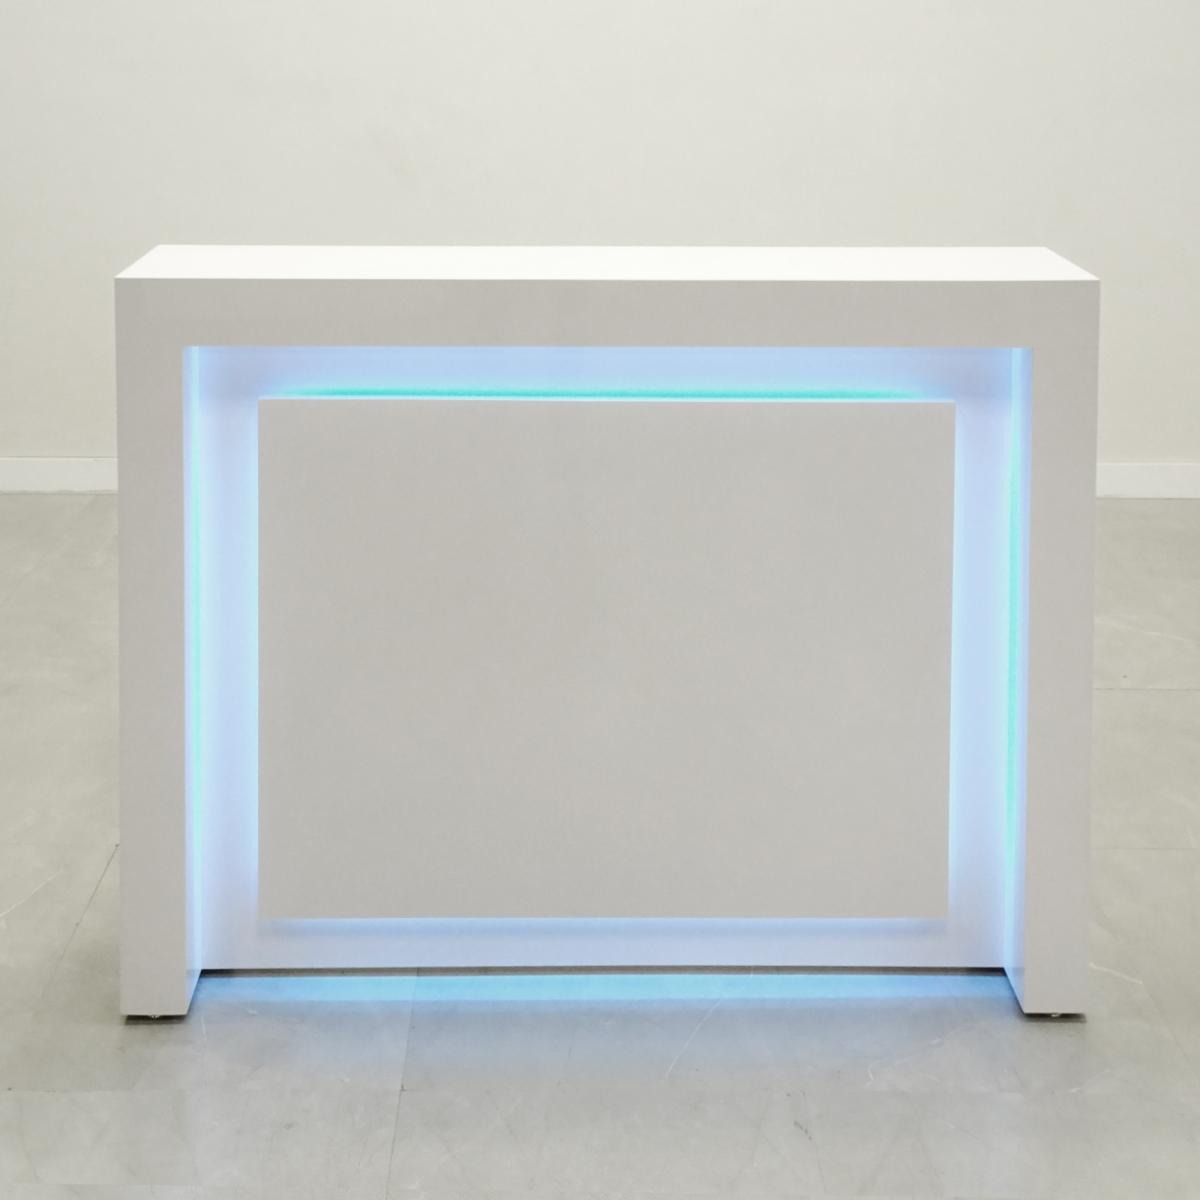 60 In. New York Reception Desk in White Gloss Laminate